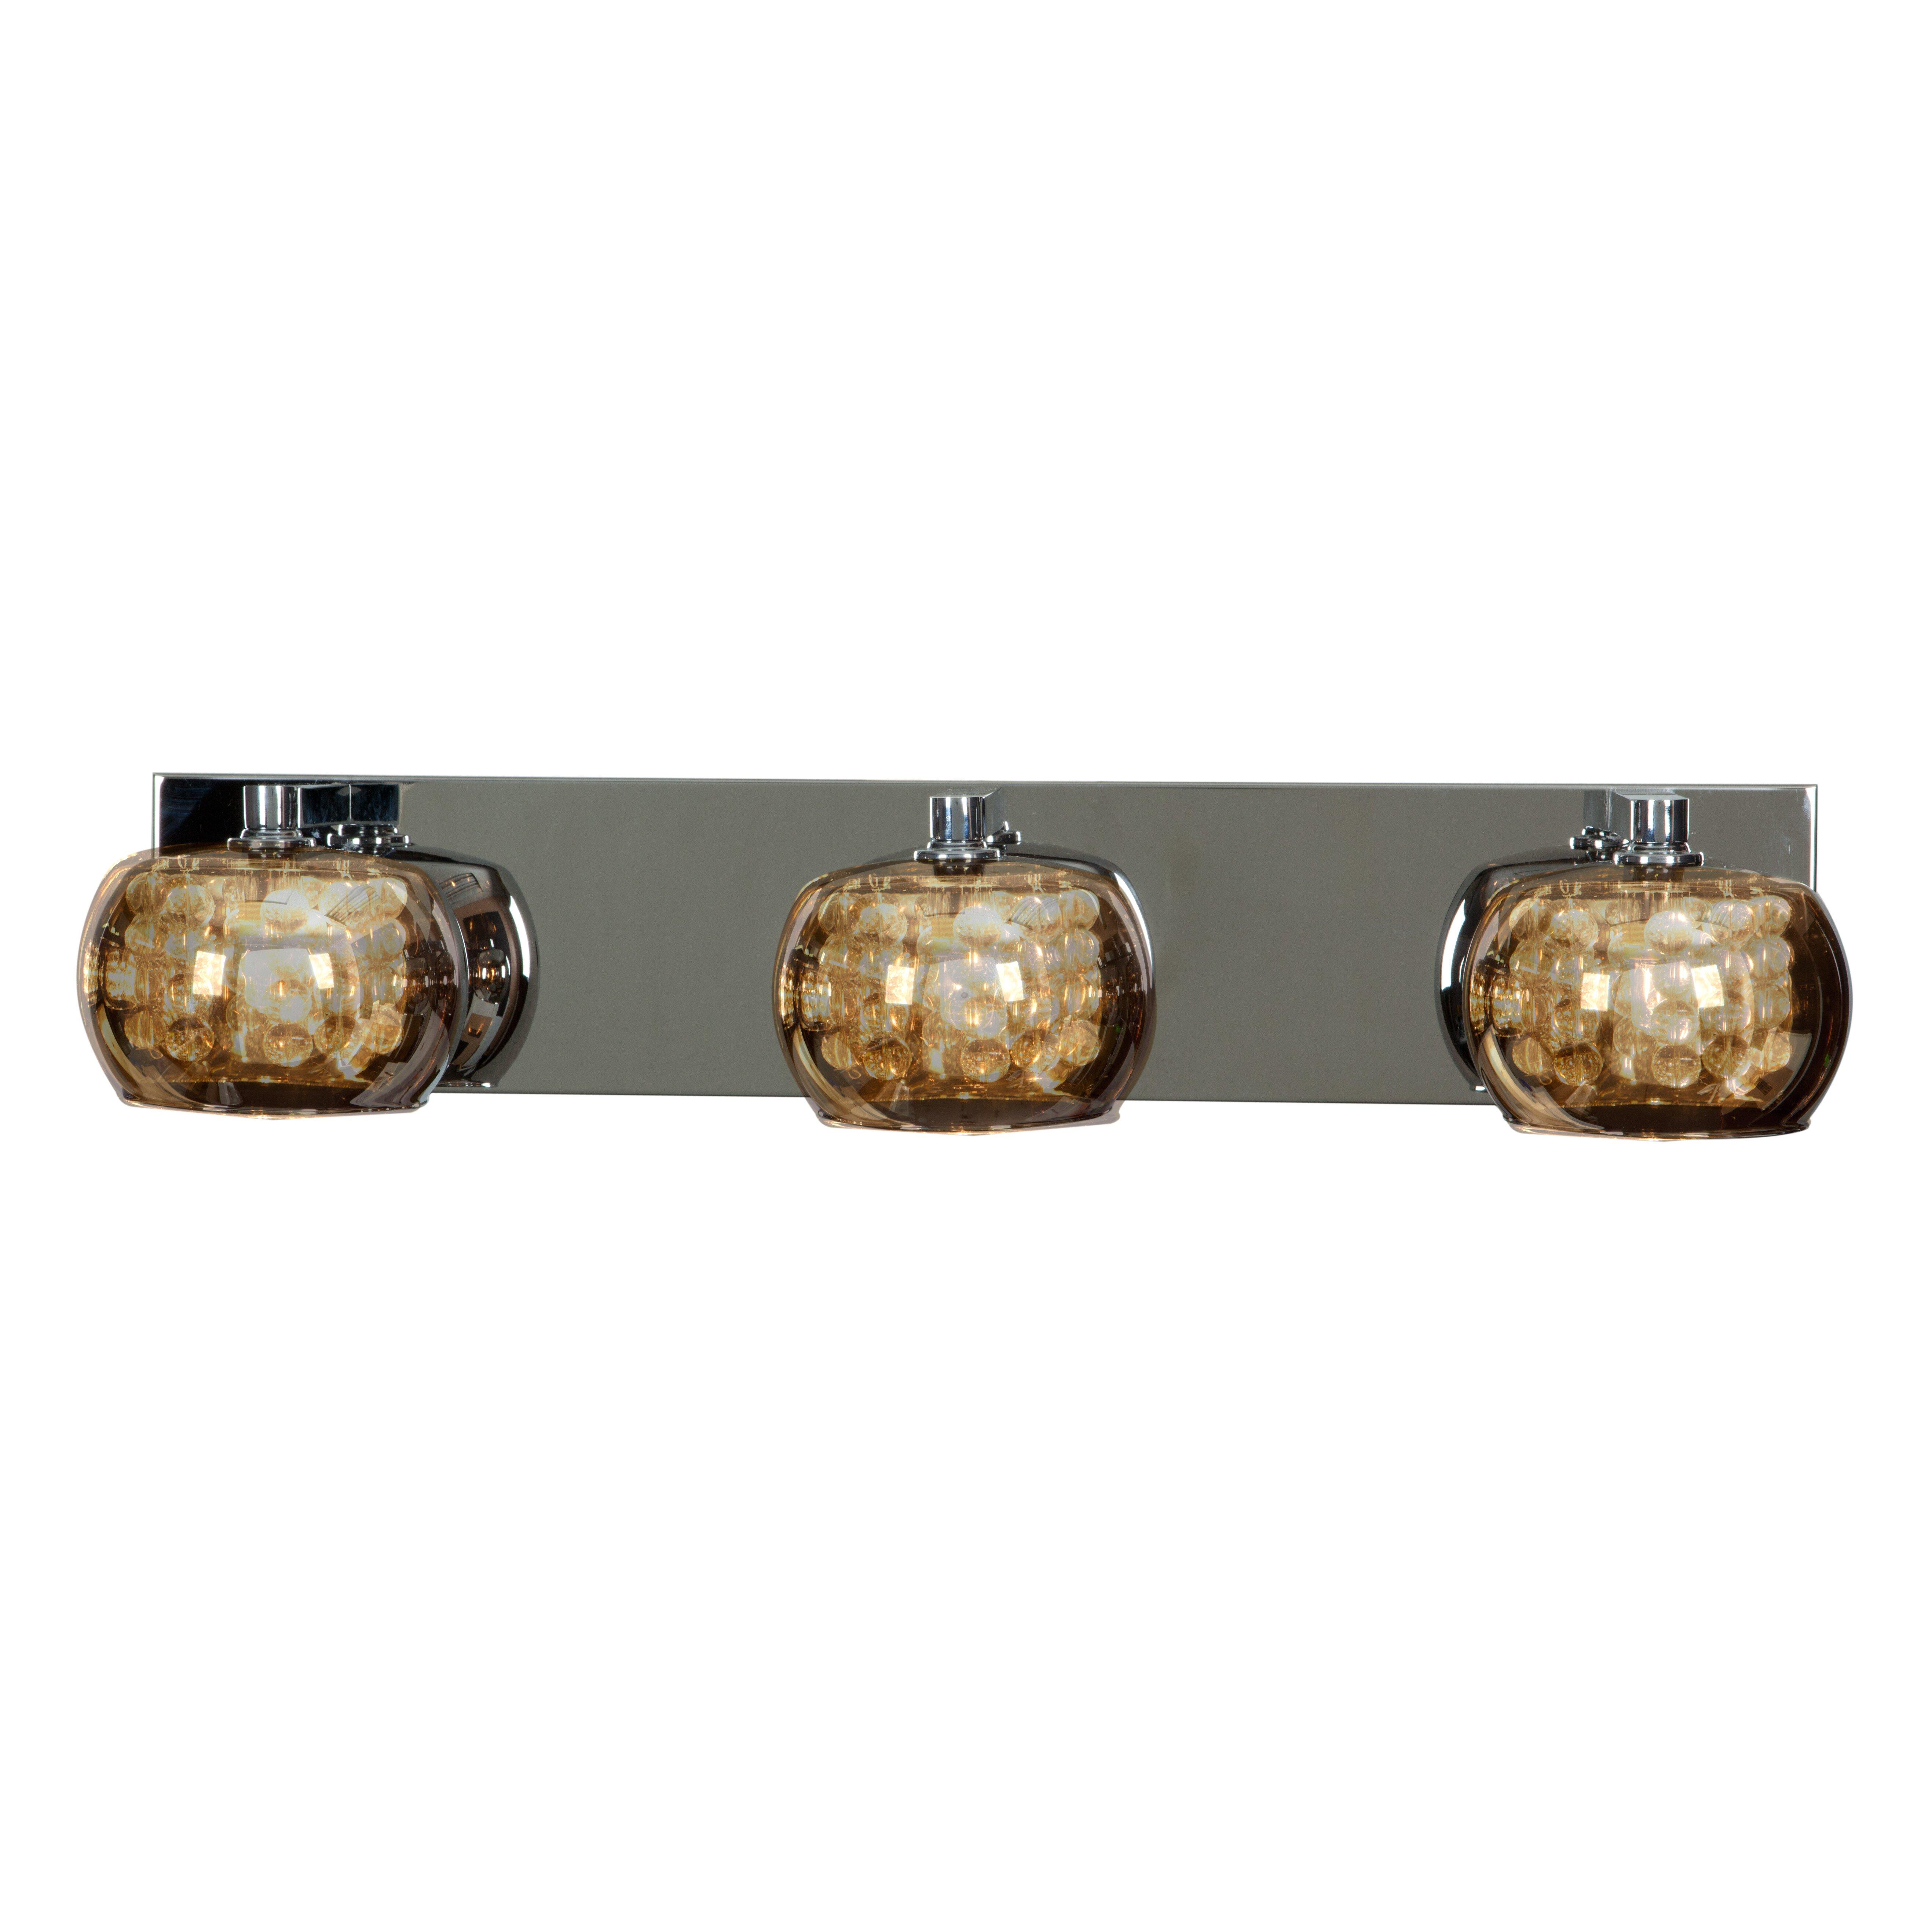 Unique BAZZ Lighting M3820CB Glam Topaz 1 Light Wall Sconce  Lowe39s Canada